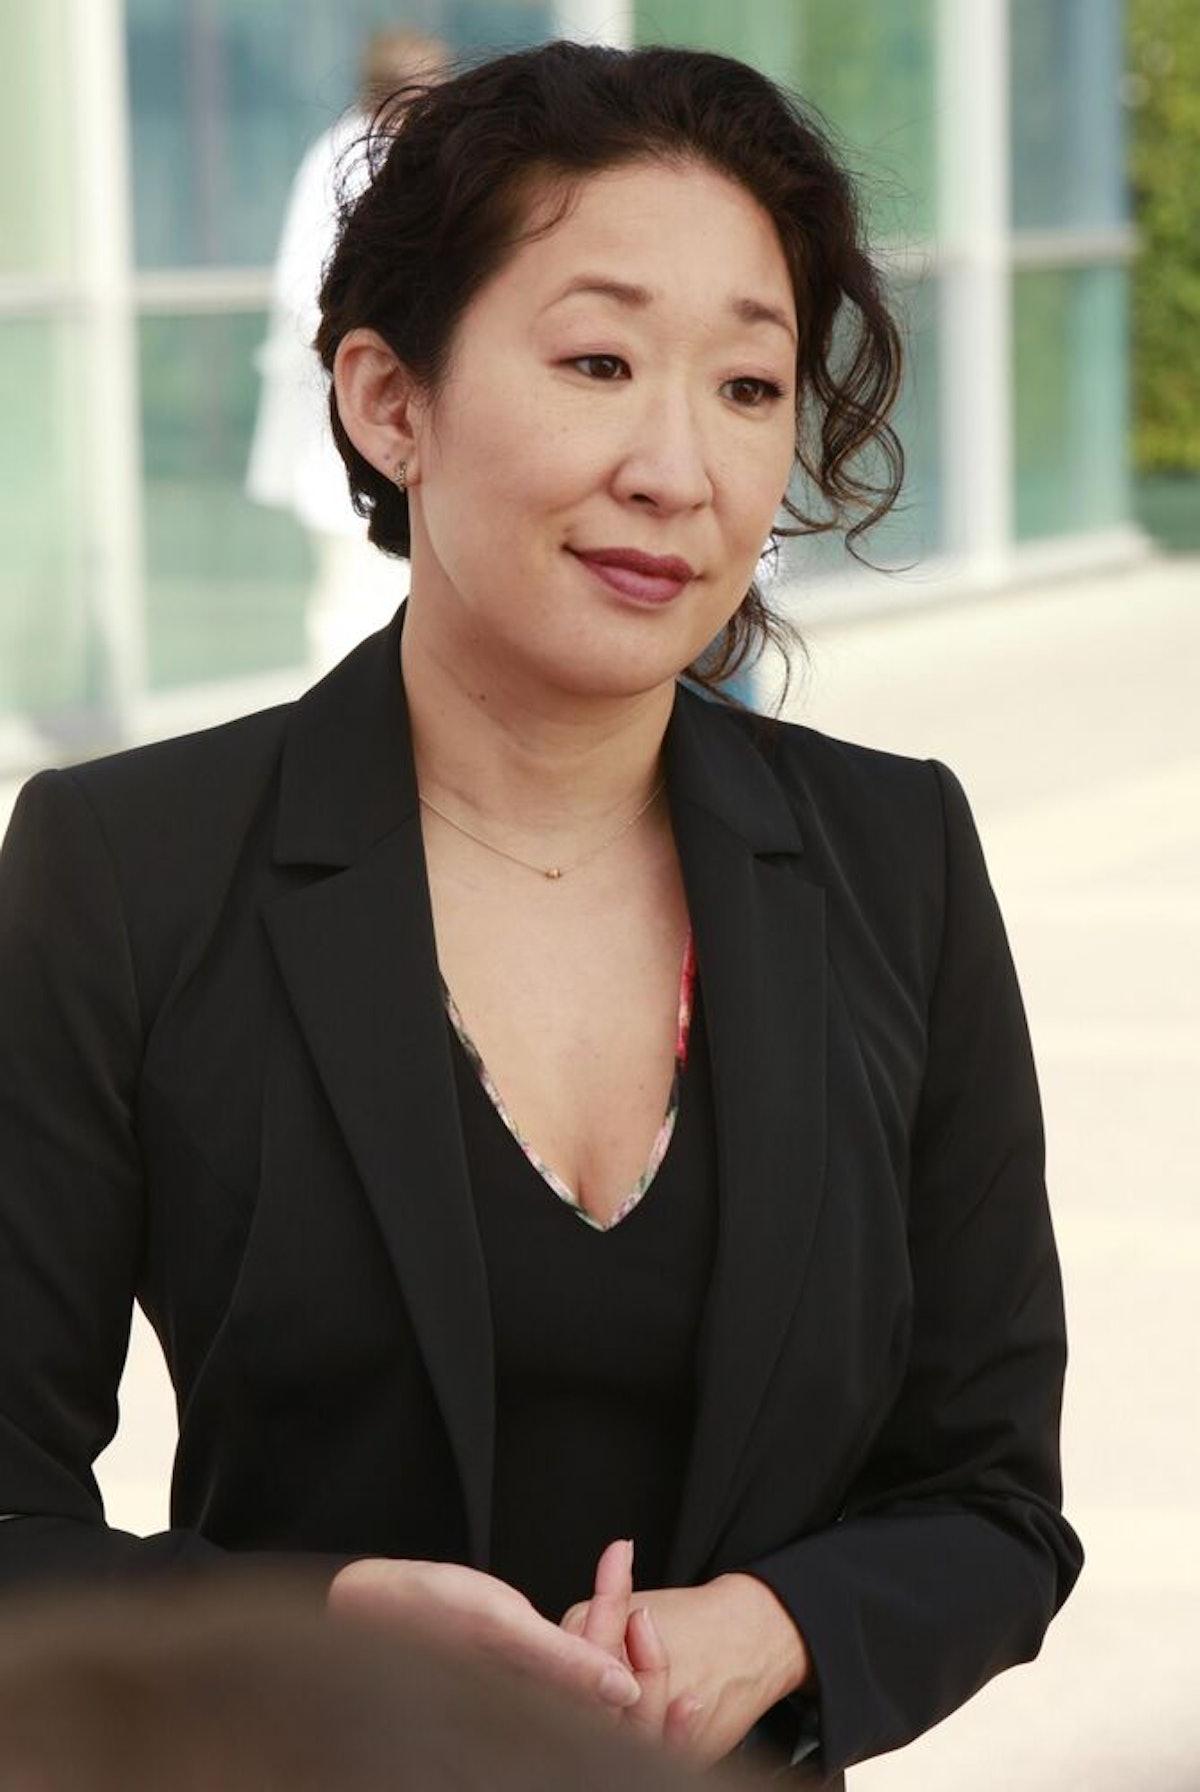 Cristina Yang (Sandra Oh) on 'Grey's Anatomy'